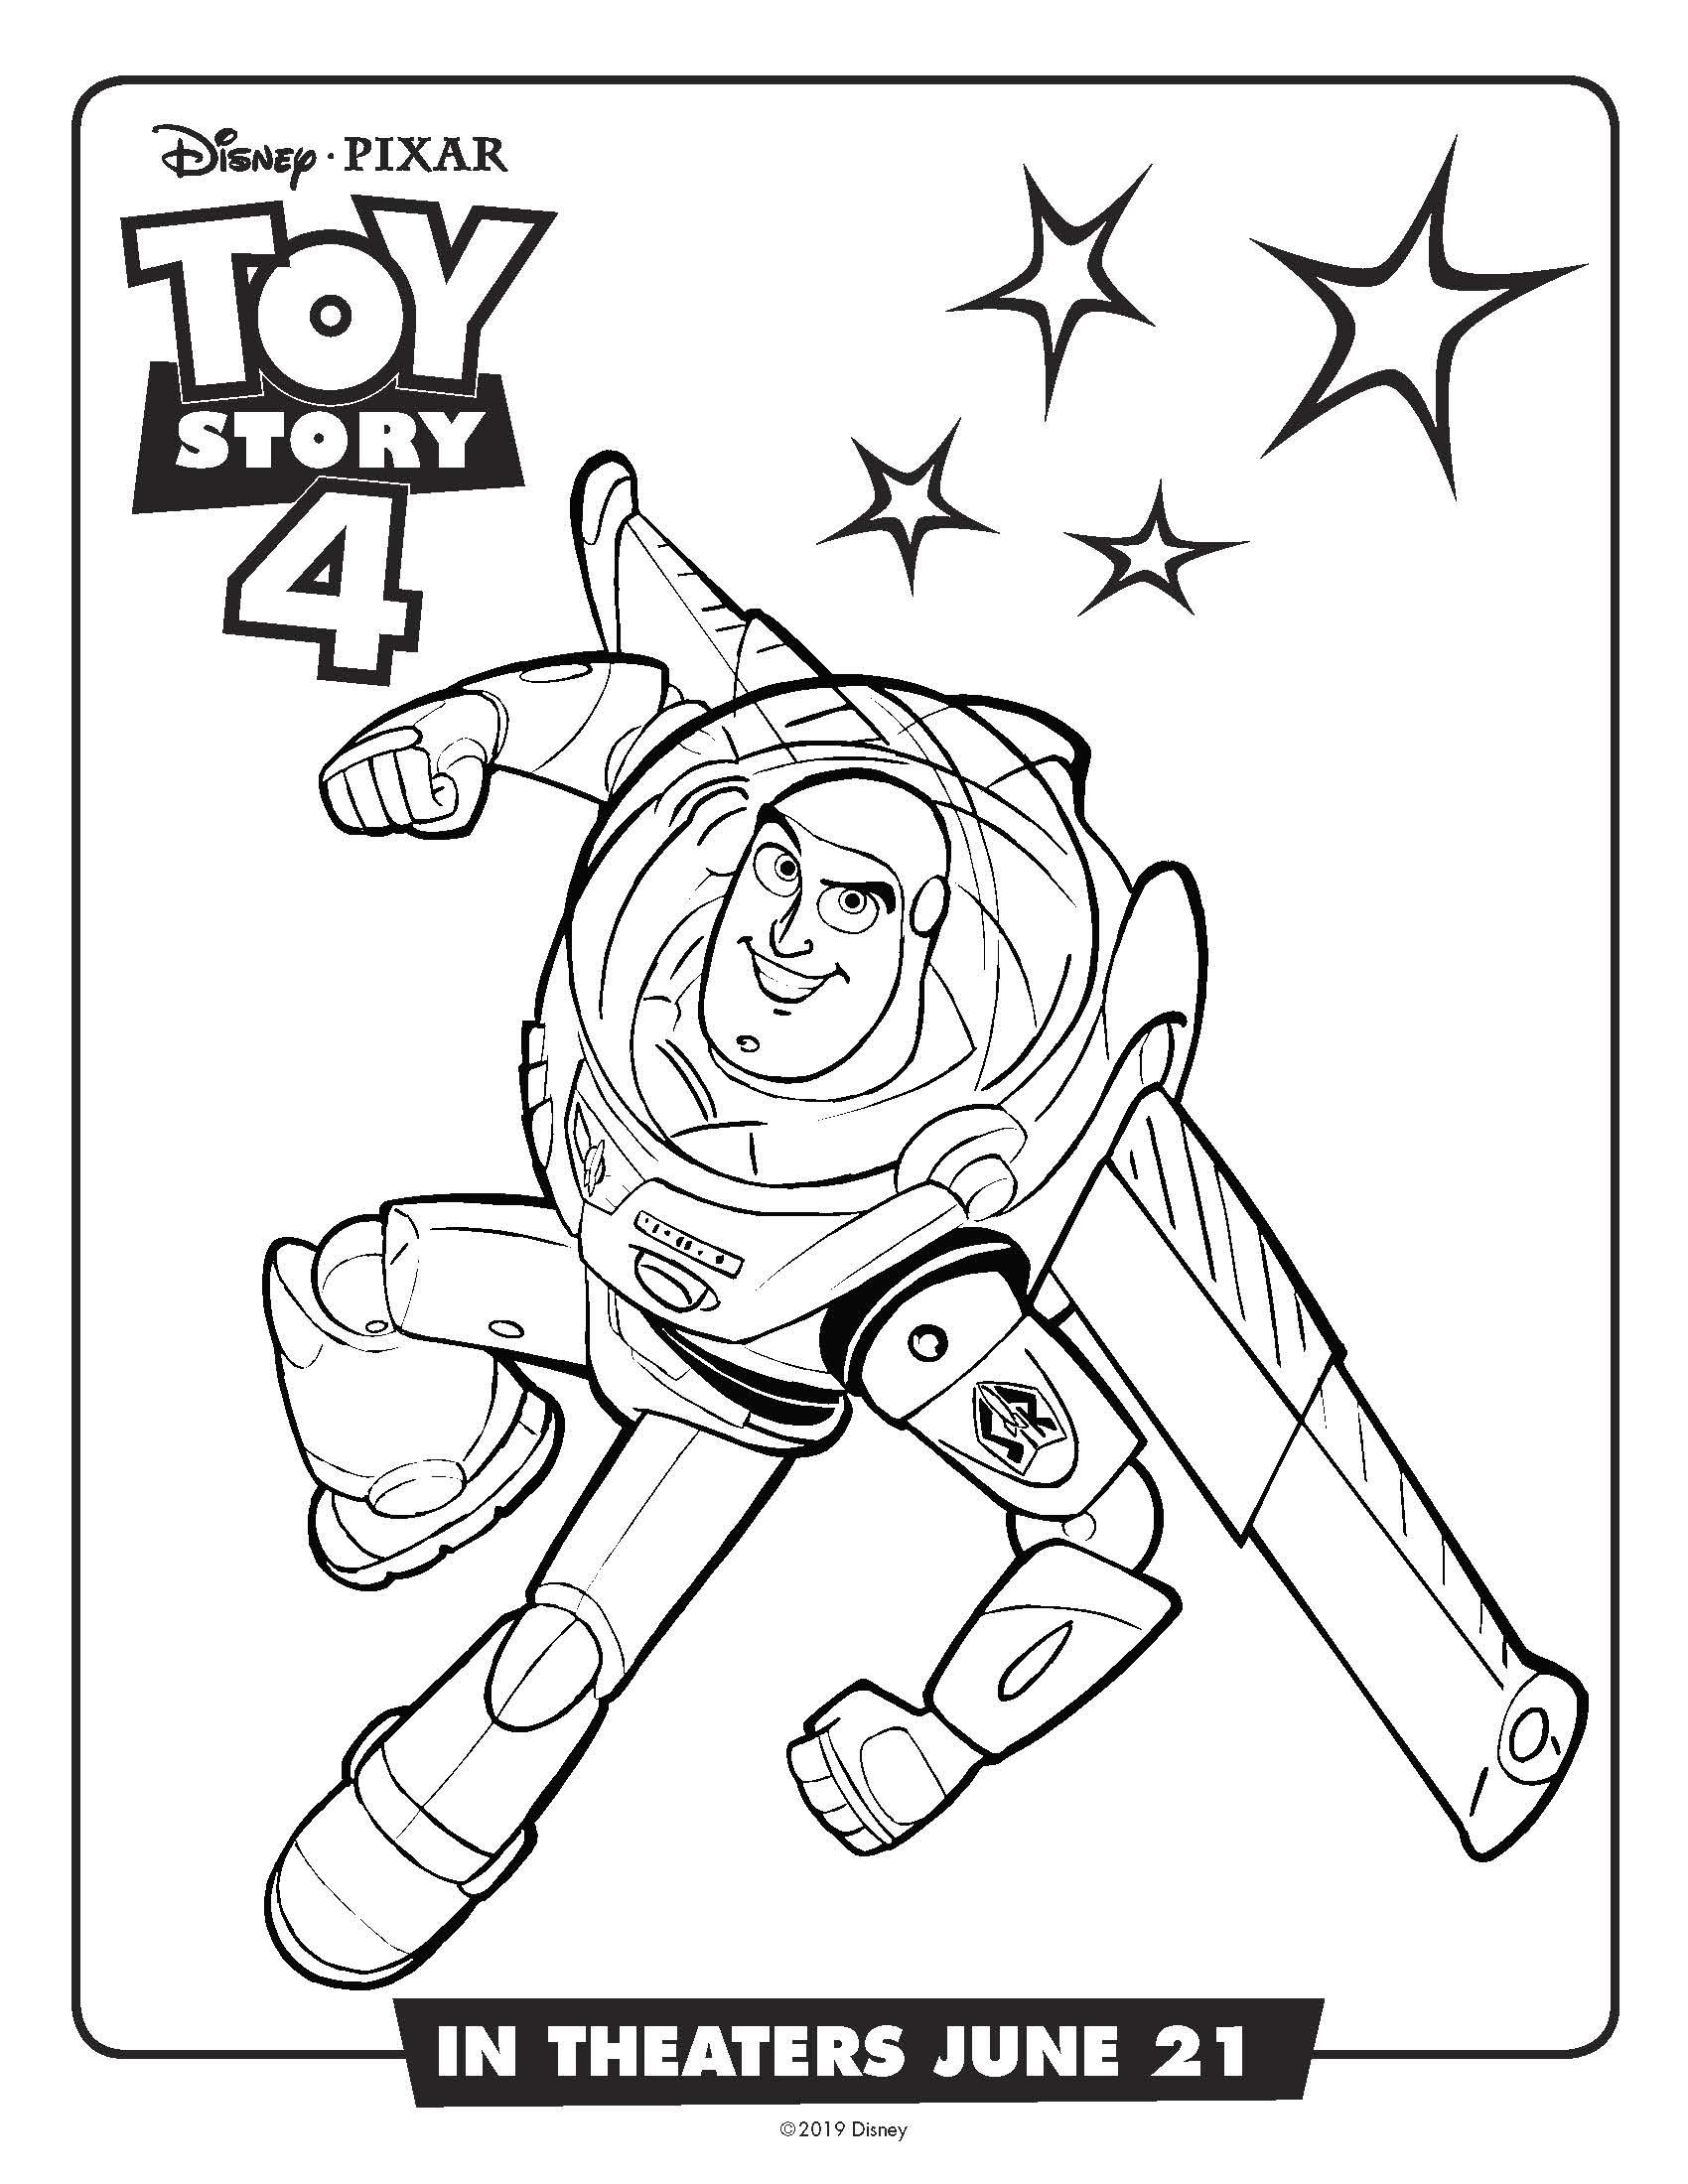 Free Printable Toy Story Buzz Lightyear Coloring Page #buzz #buzzlightyear #toystory #toystory4 #coloringpage #freeprintable #disney